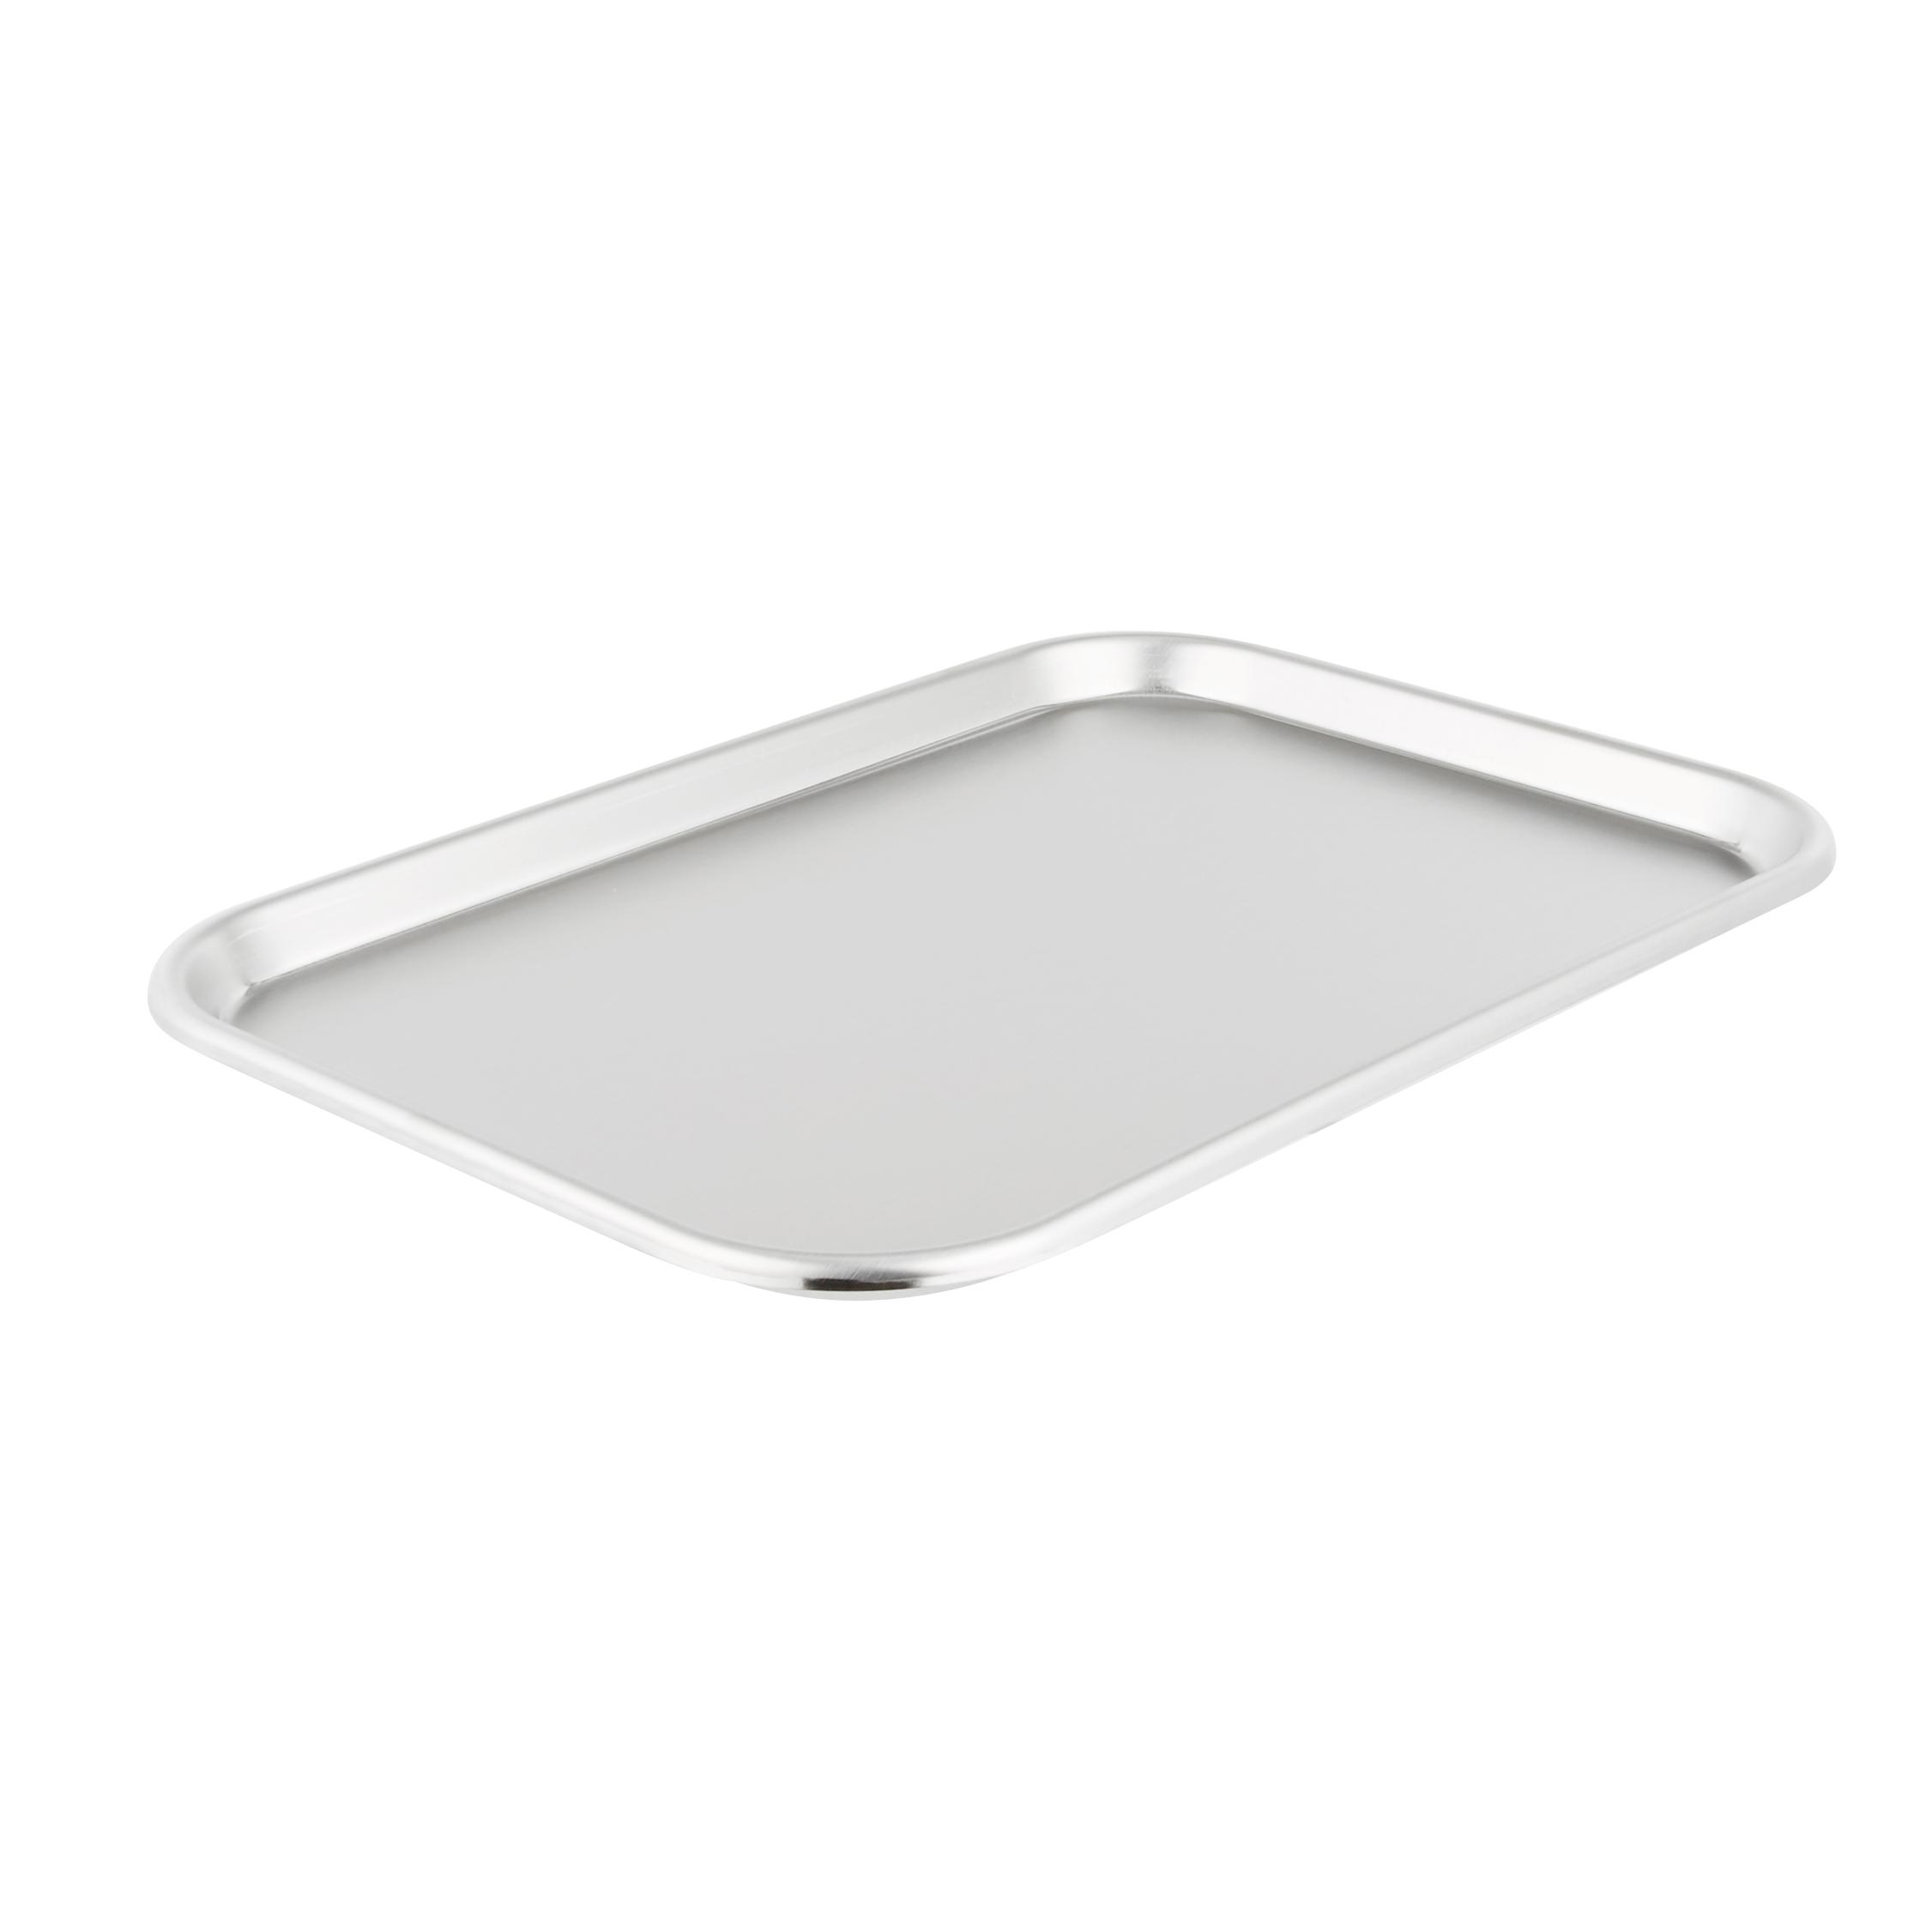 Vollrath 80130 serving & display tray, metal